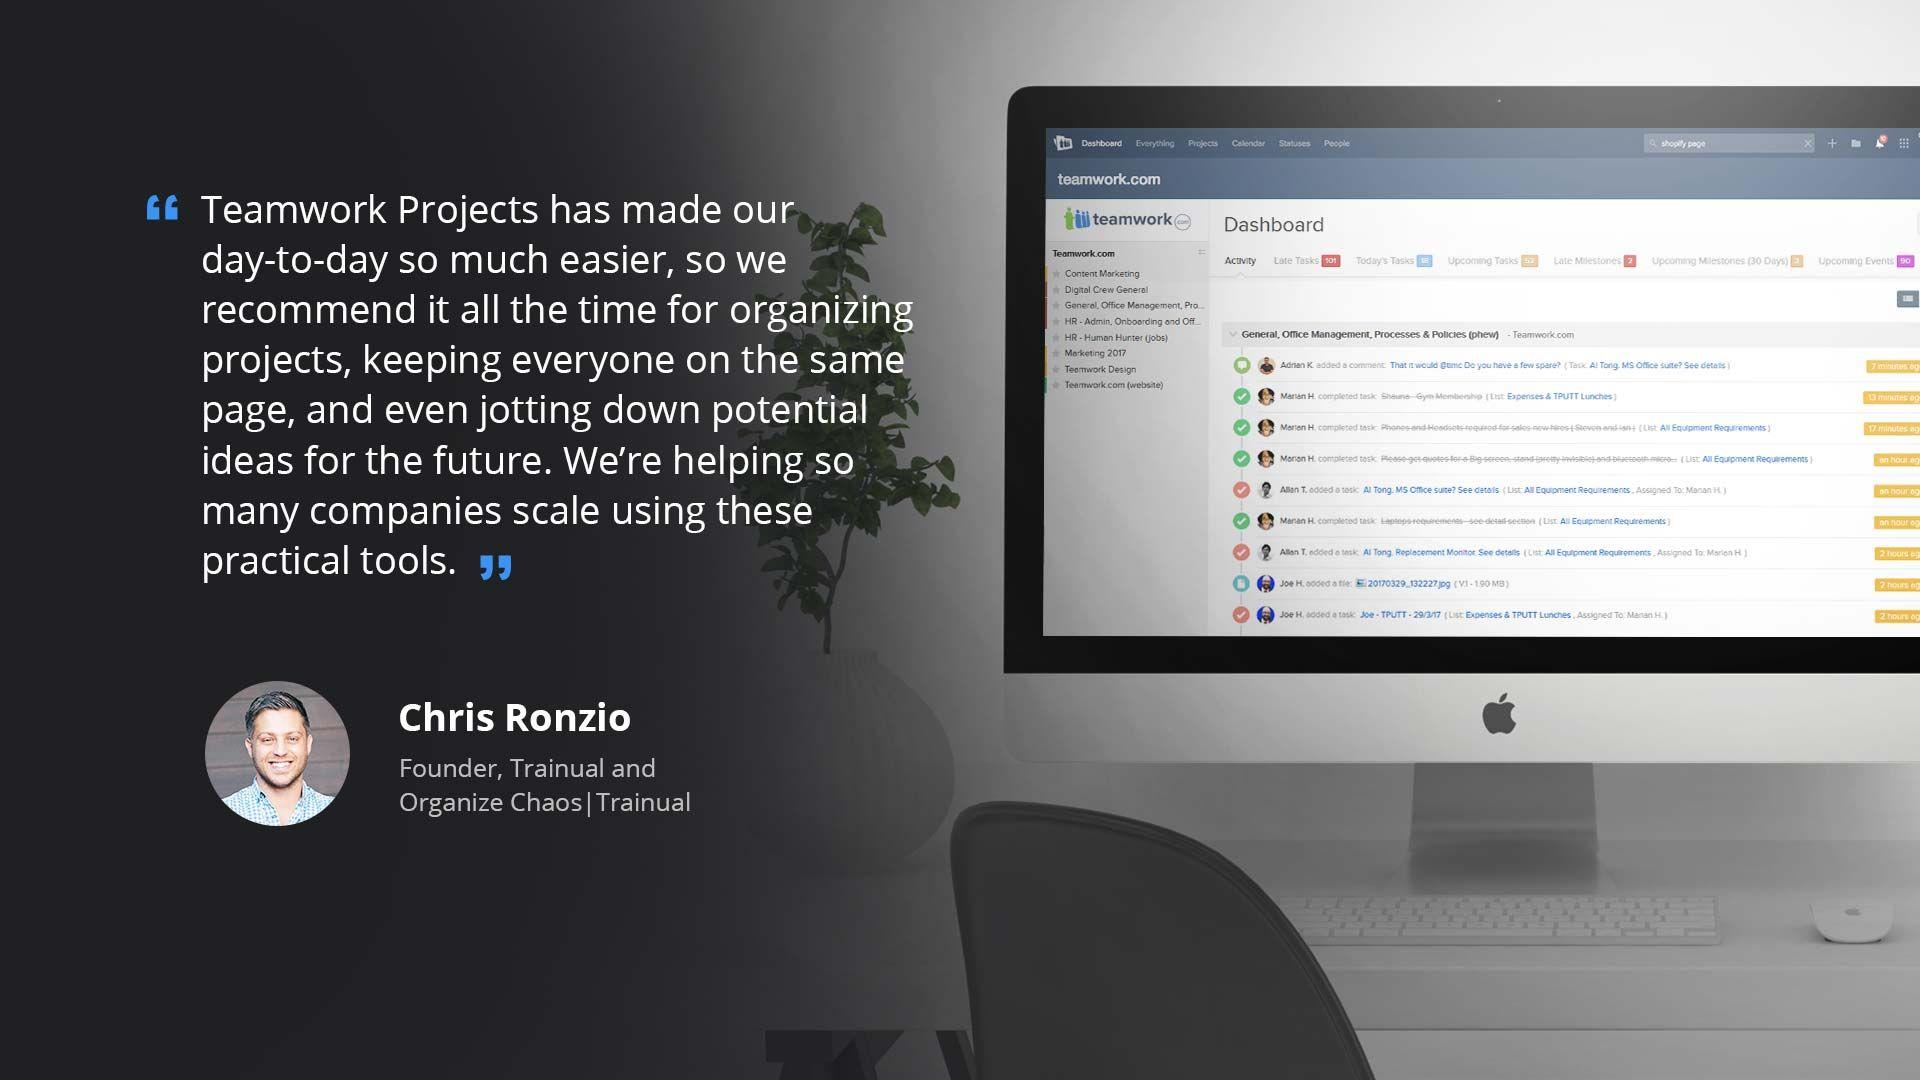 Trainual and Teamwork Projects   Teamwork.com